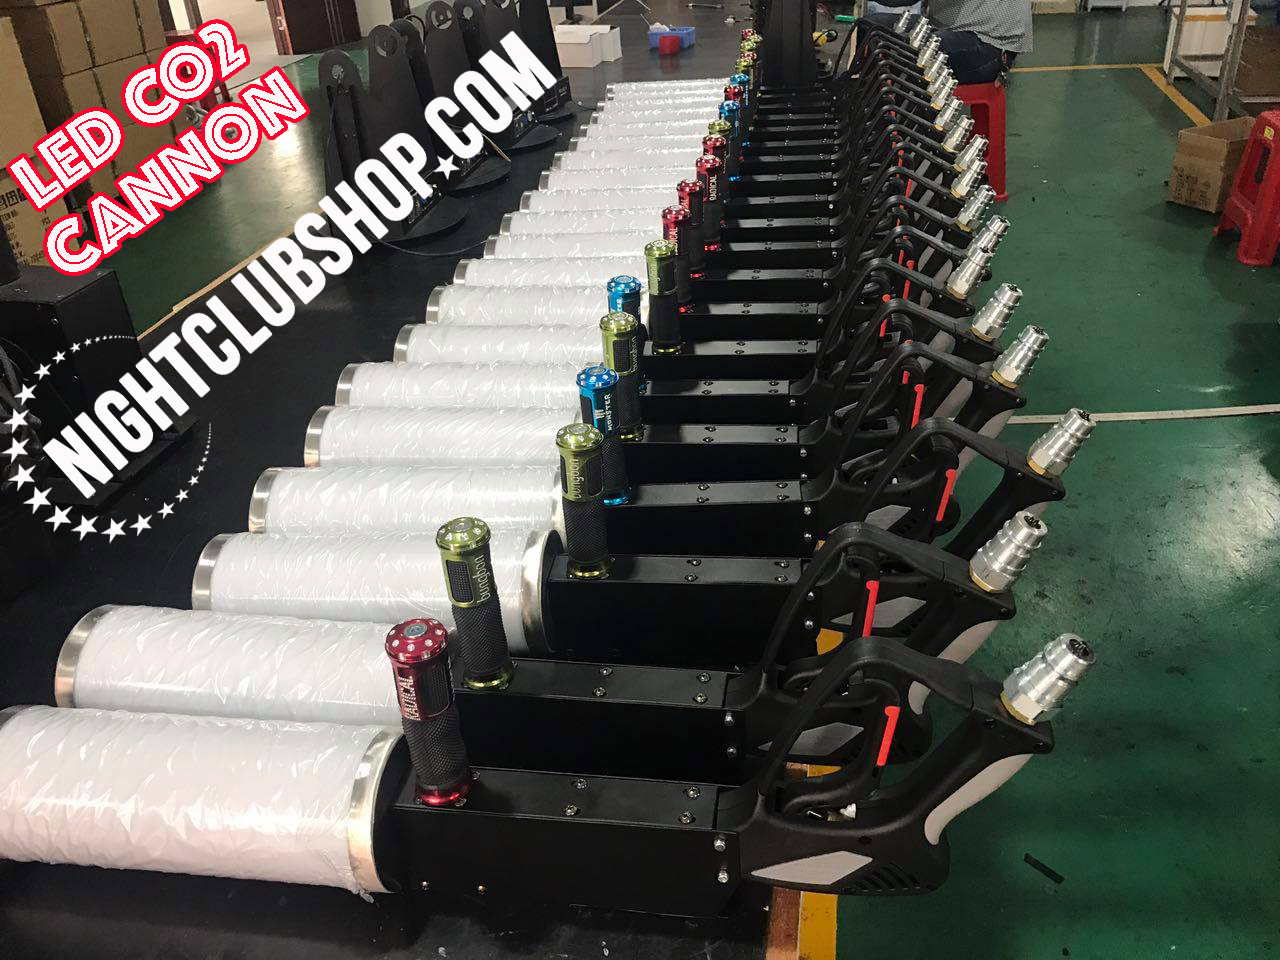 led-co2-jet-cannon-handheld-gun-shotgun-cryojet-cryocannon-nightclubshop.jpg